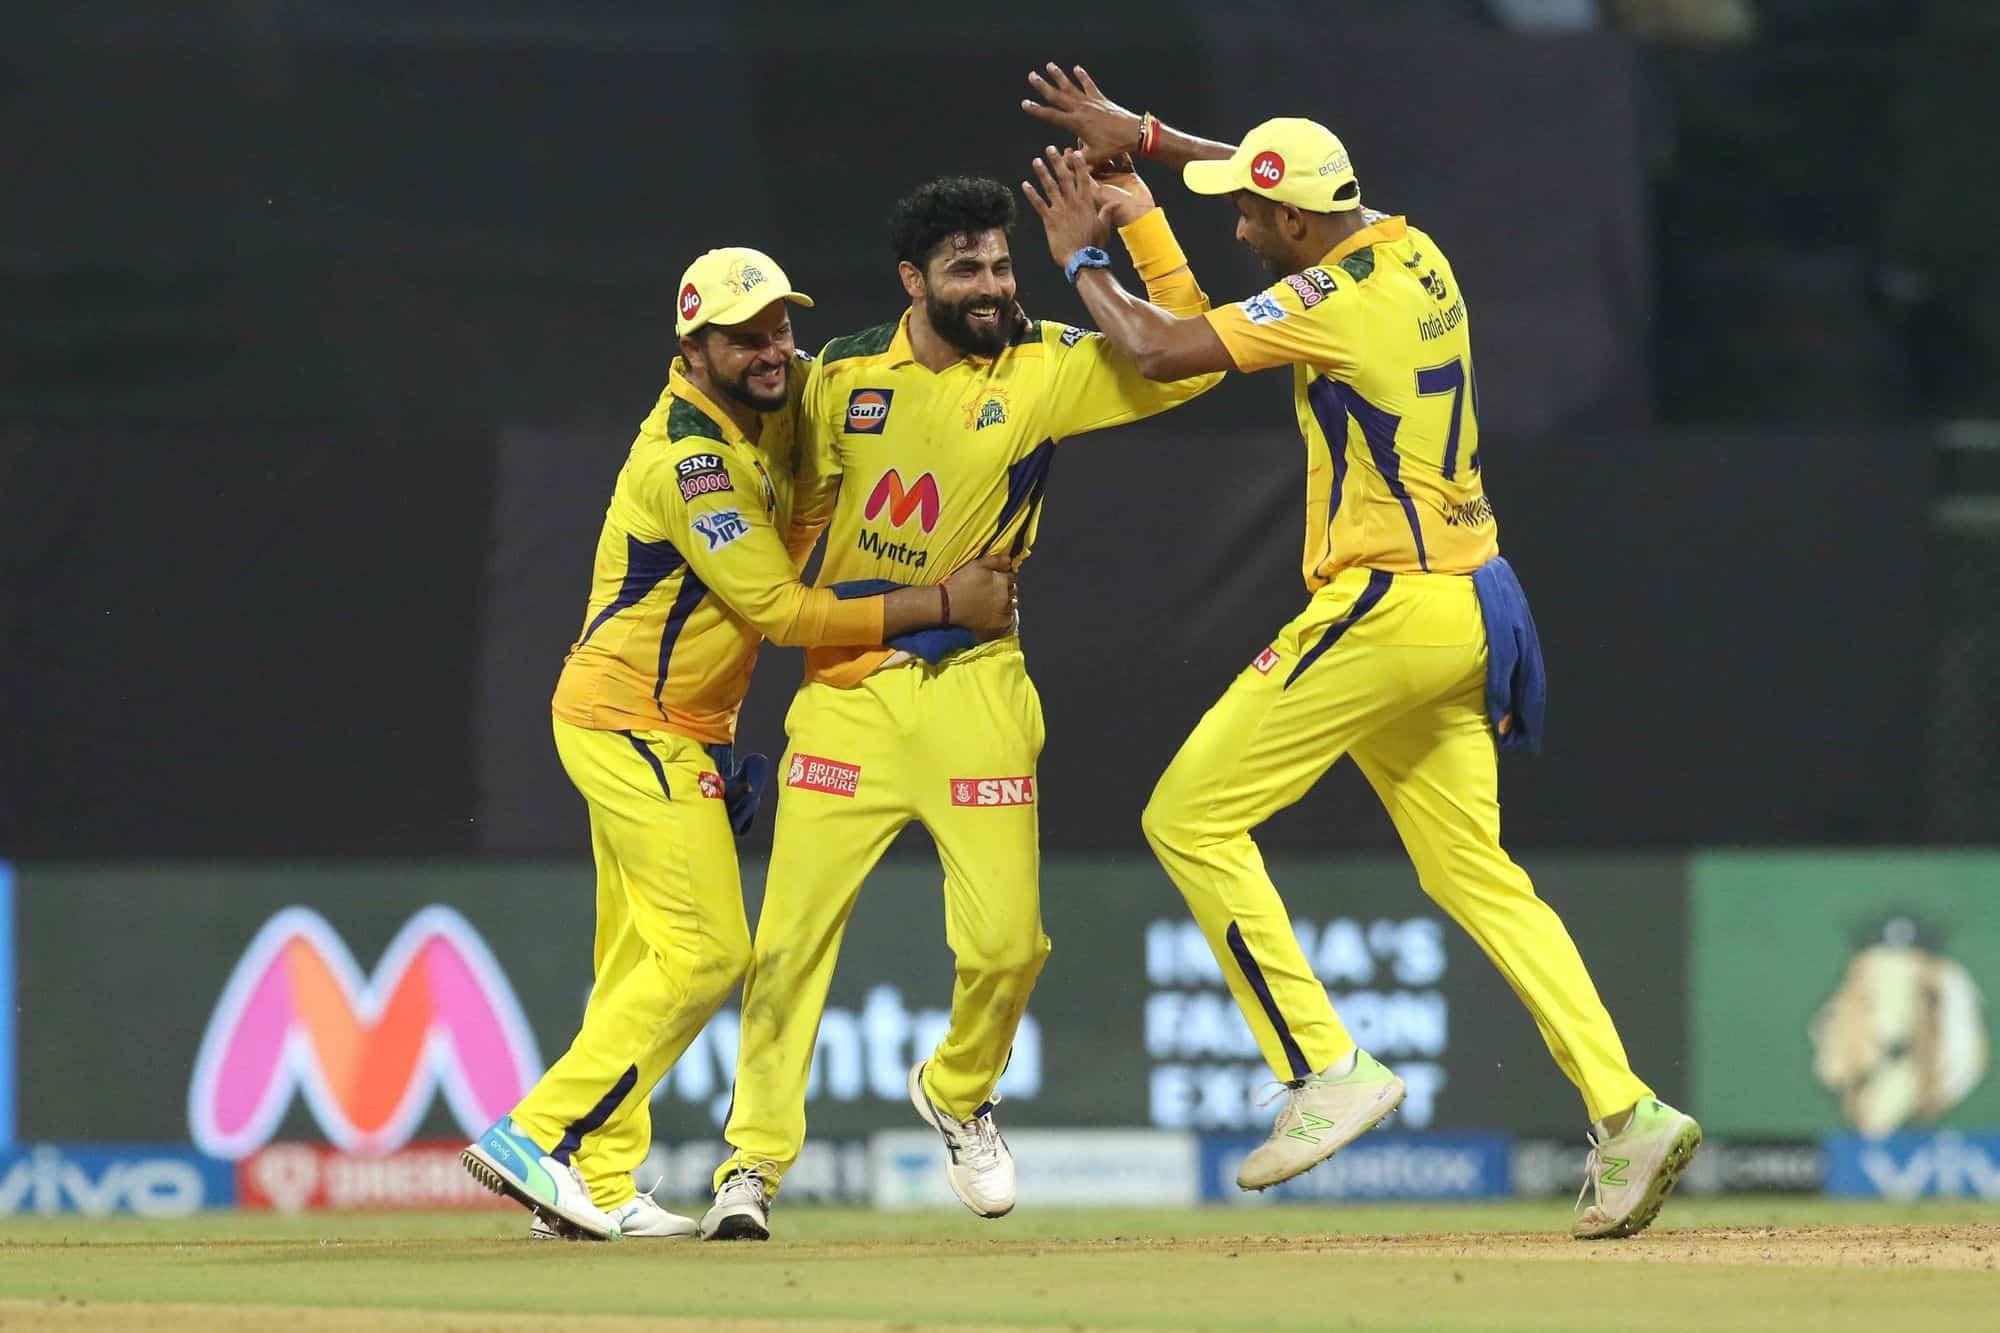 CSK vs RR: Moeen Ali, Ravindra Jadeja Shine As Chennai Super Kings Choke Rajasthan Royals With Spin